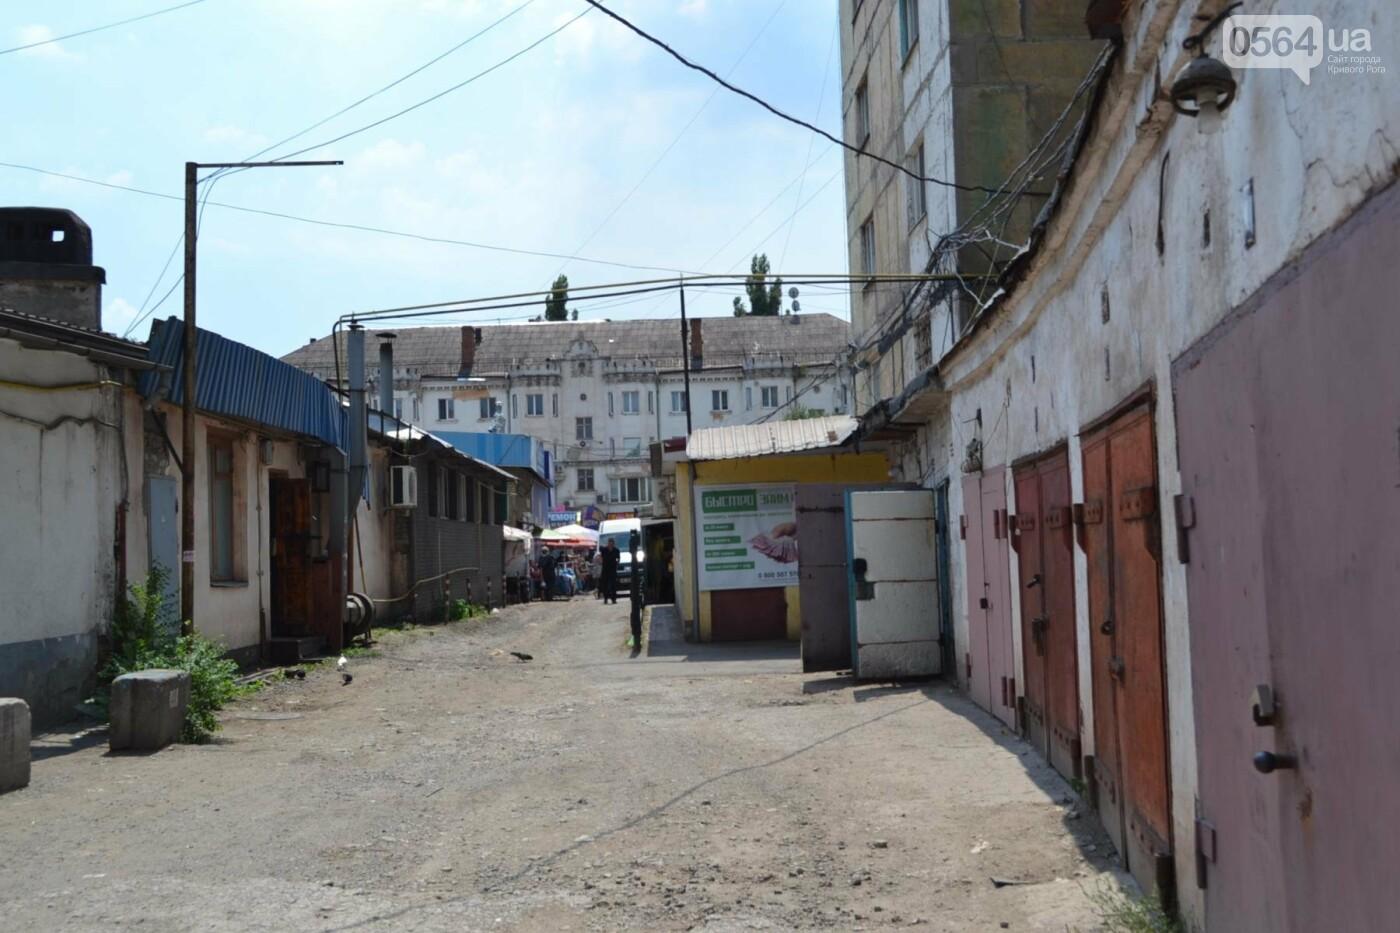 "Темная сторона ""города без окраин"": В центре Кривого Рога - гаражи-наливайки, торговля самогоном и люди-тени, - ФОТО, фото-17"